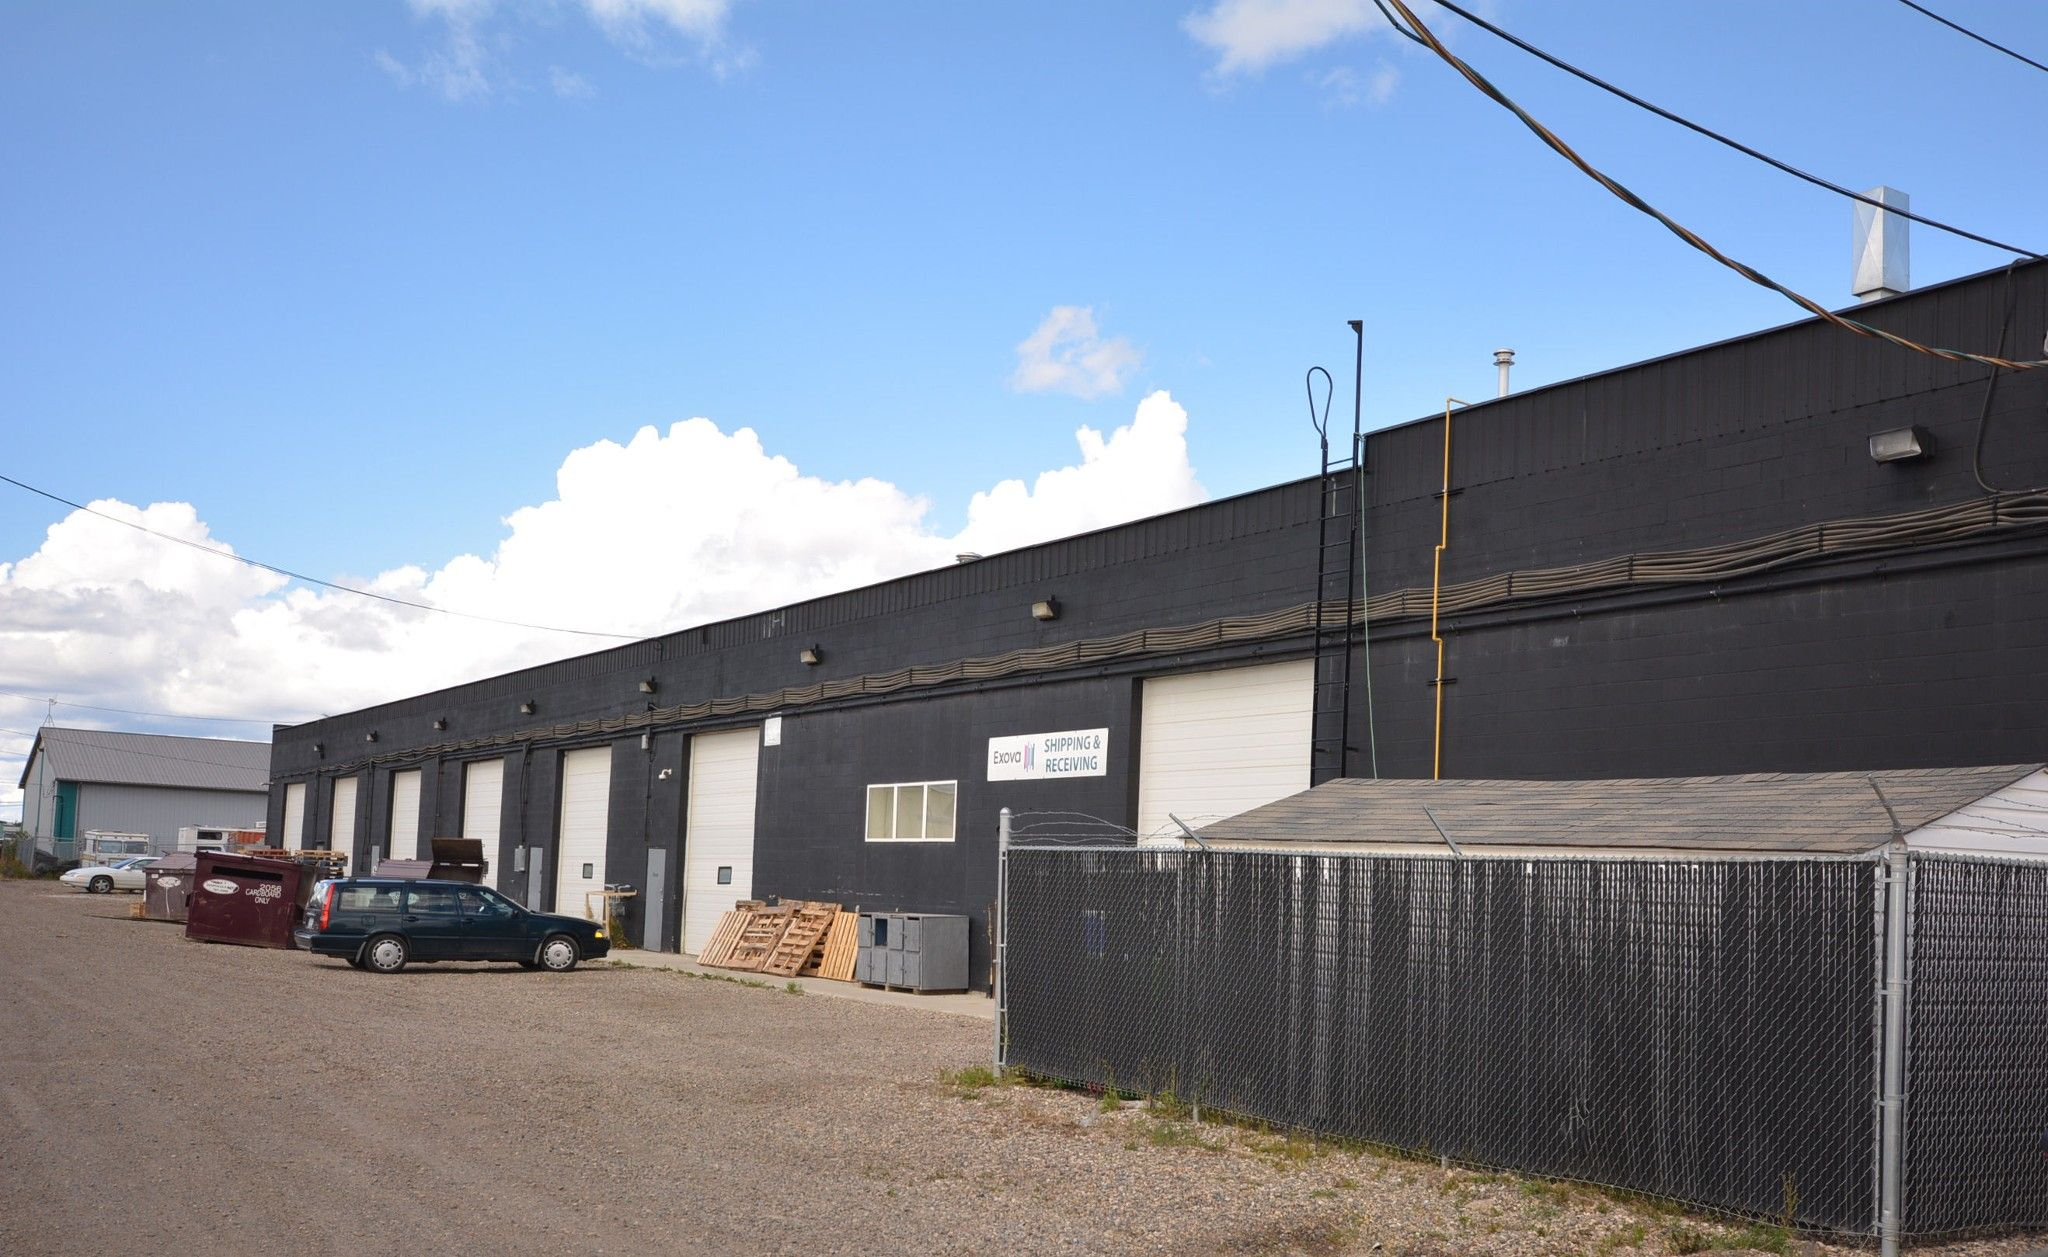 Photo 3: Photos: 8822 100 Street in Fort St. John: Fort St. John - City SW Industrial for sale (Fort St. John (Zone 60))